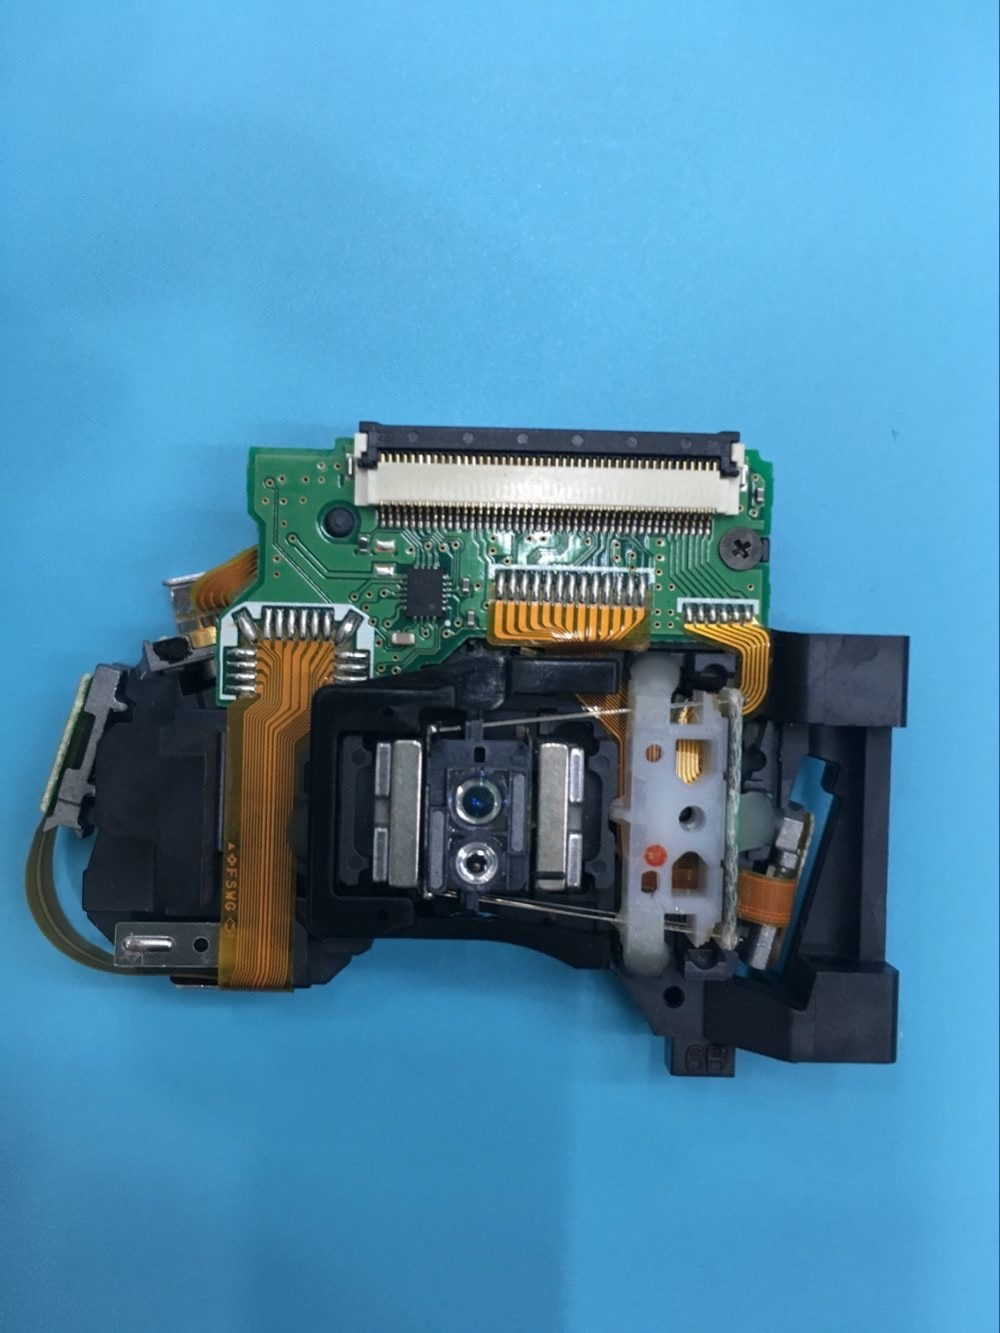 Лазерный объектив для PS3 SLIM KEM-450 DAA EAA AAA, оригинальный объектив KES-450A BLU RAY 450